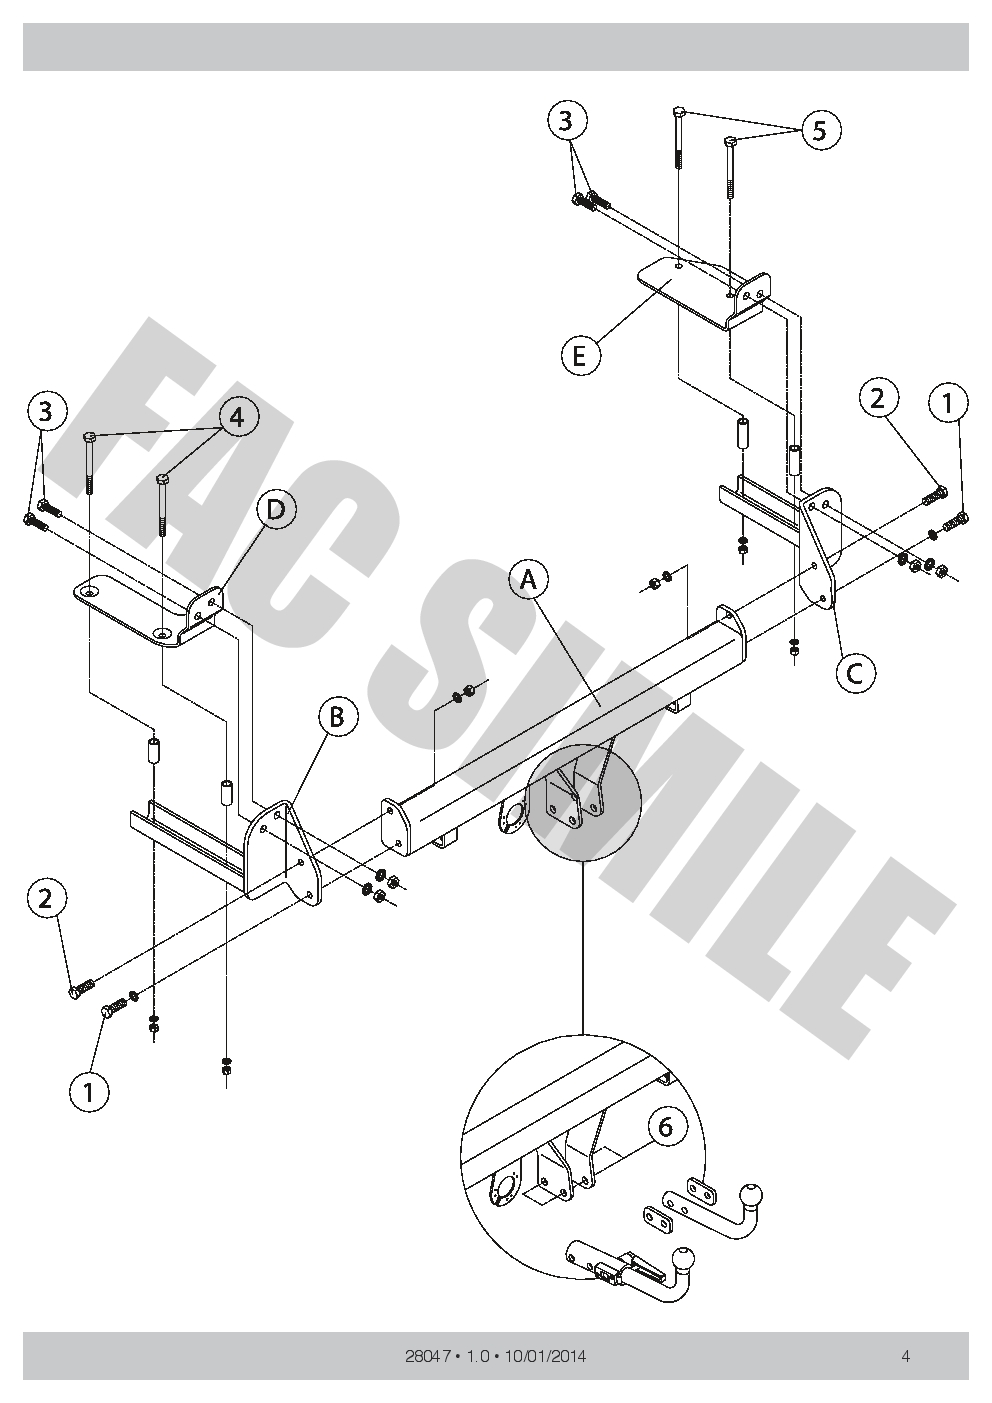 Detachable Towbar 7 pin kit wiring New Car Tow Bar for Opel Vauxhall